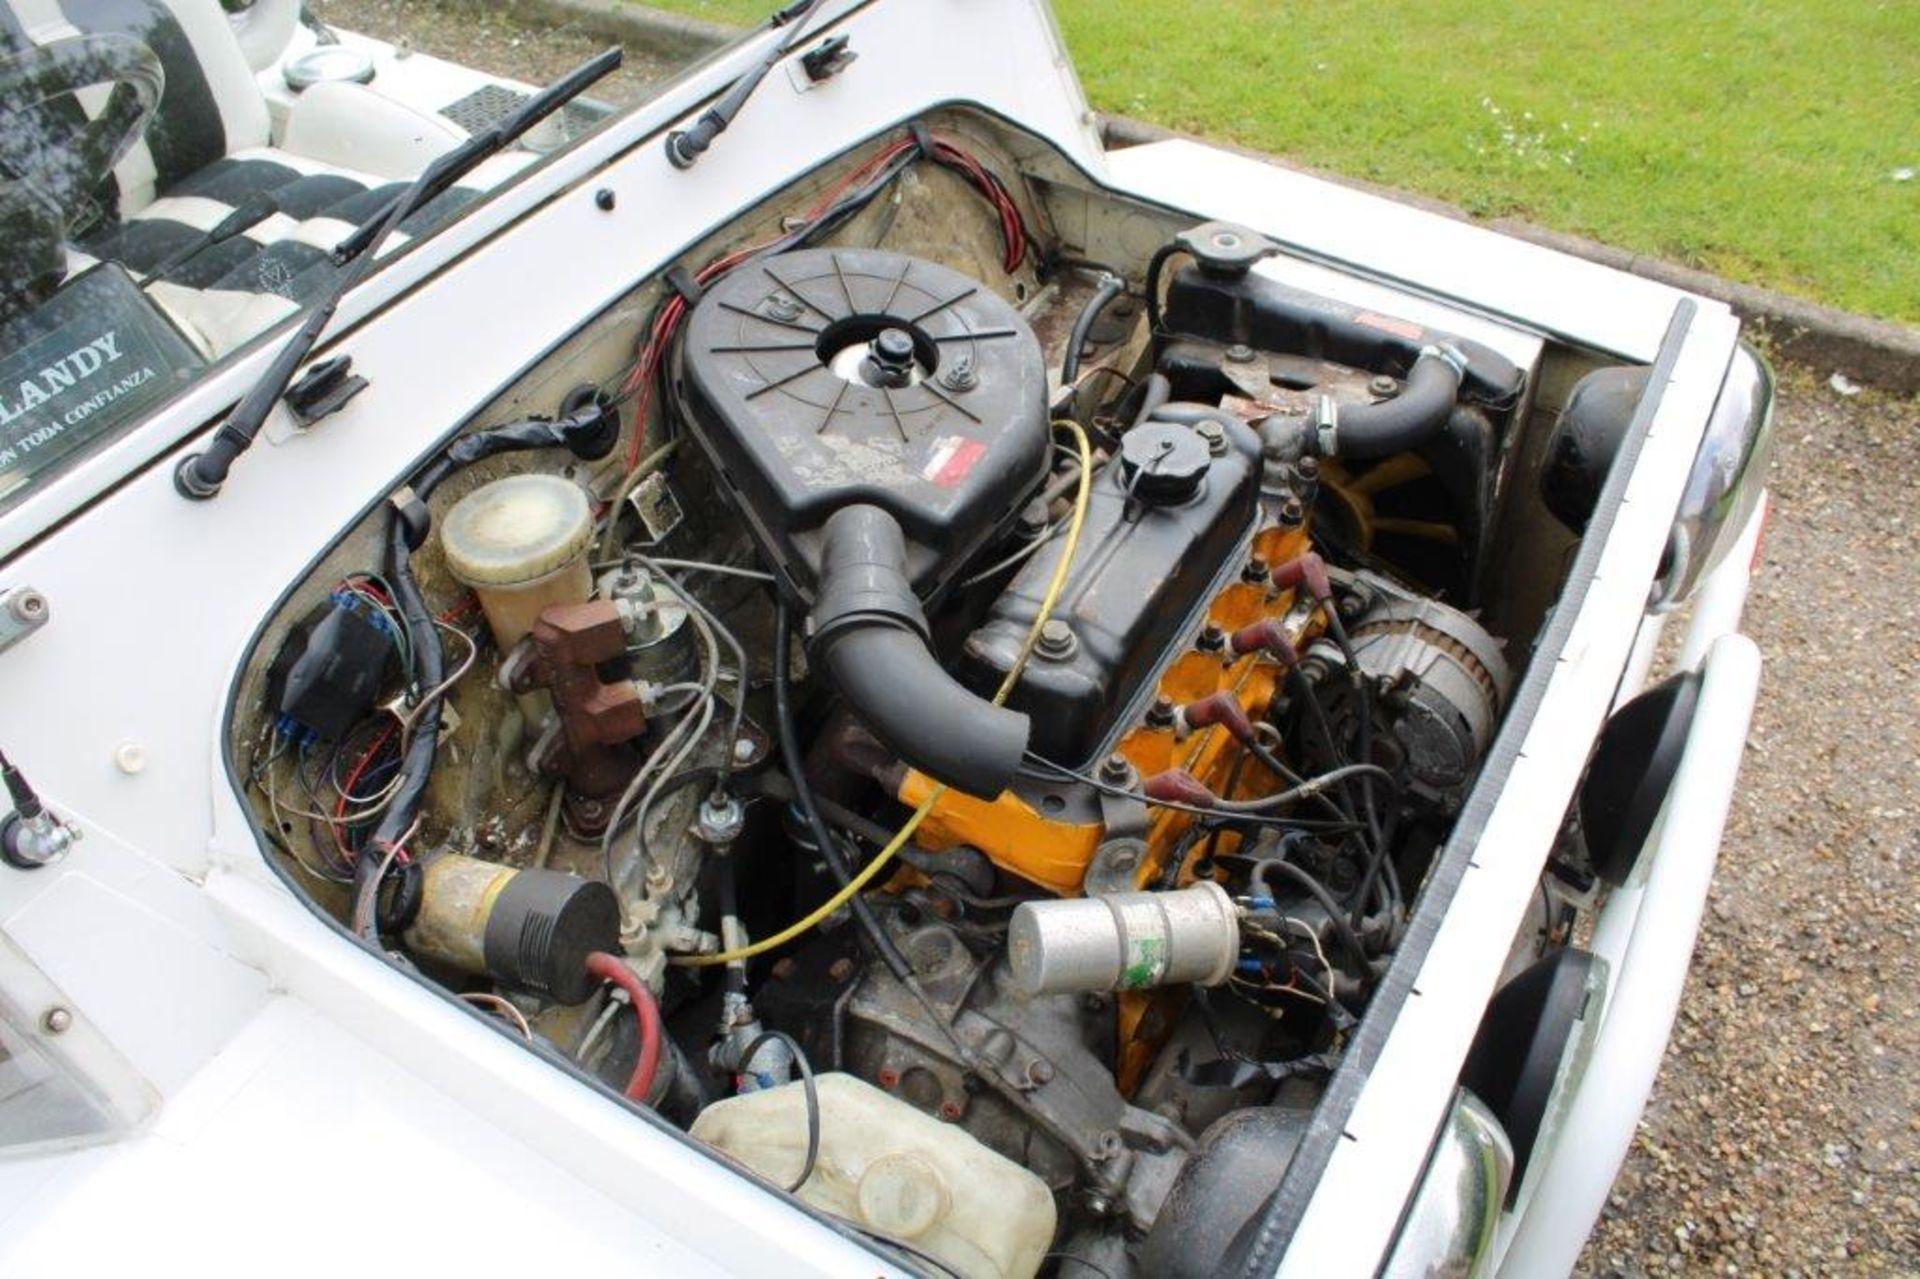 1988 Austin Rover Mini Moke - Image 20 of 22